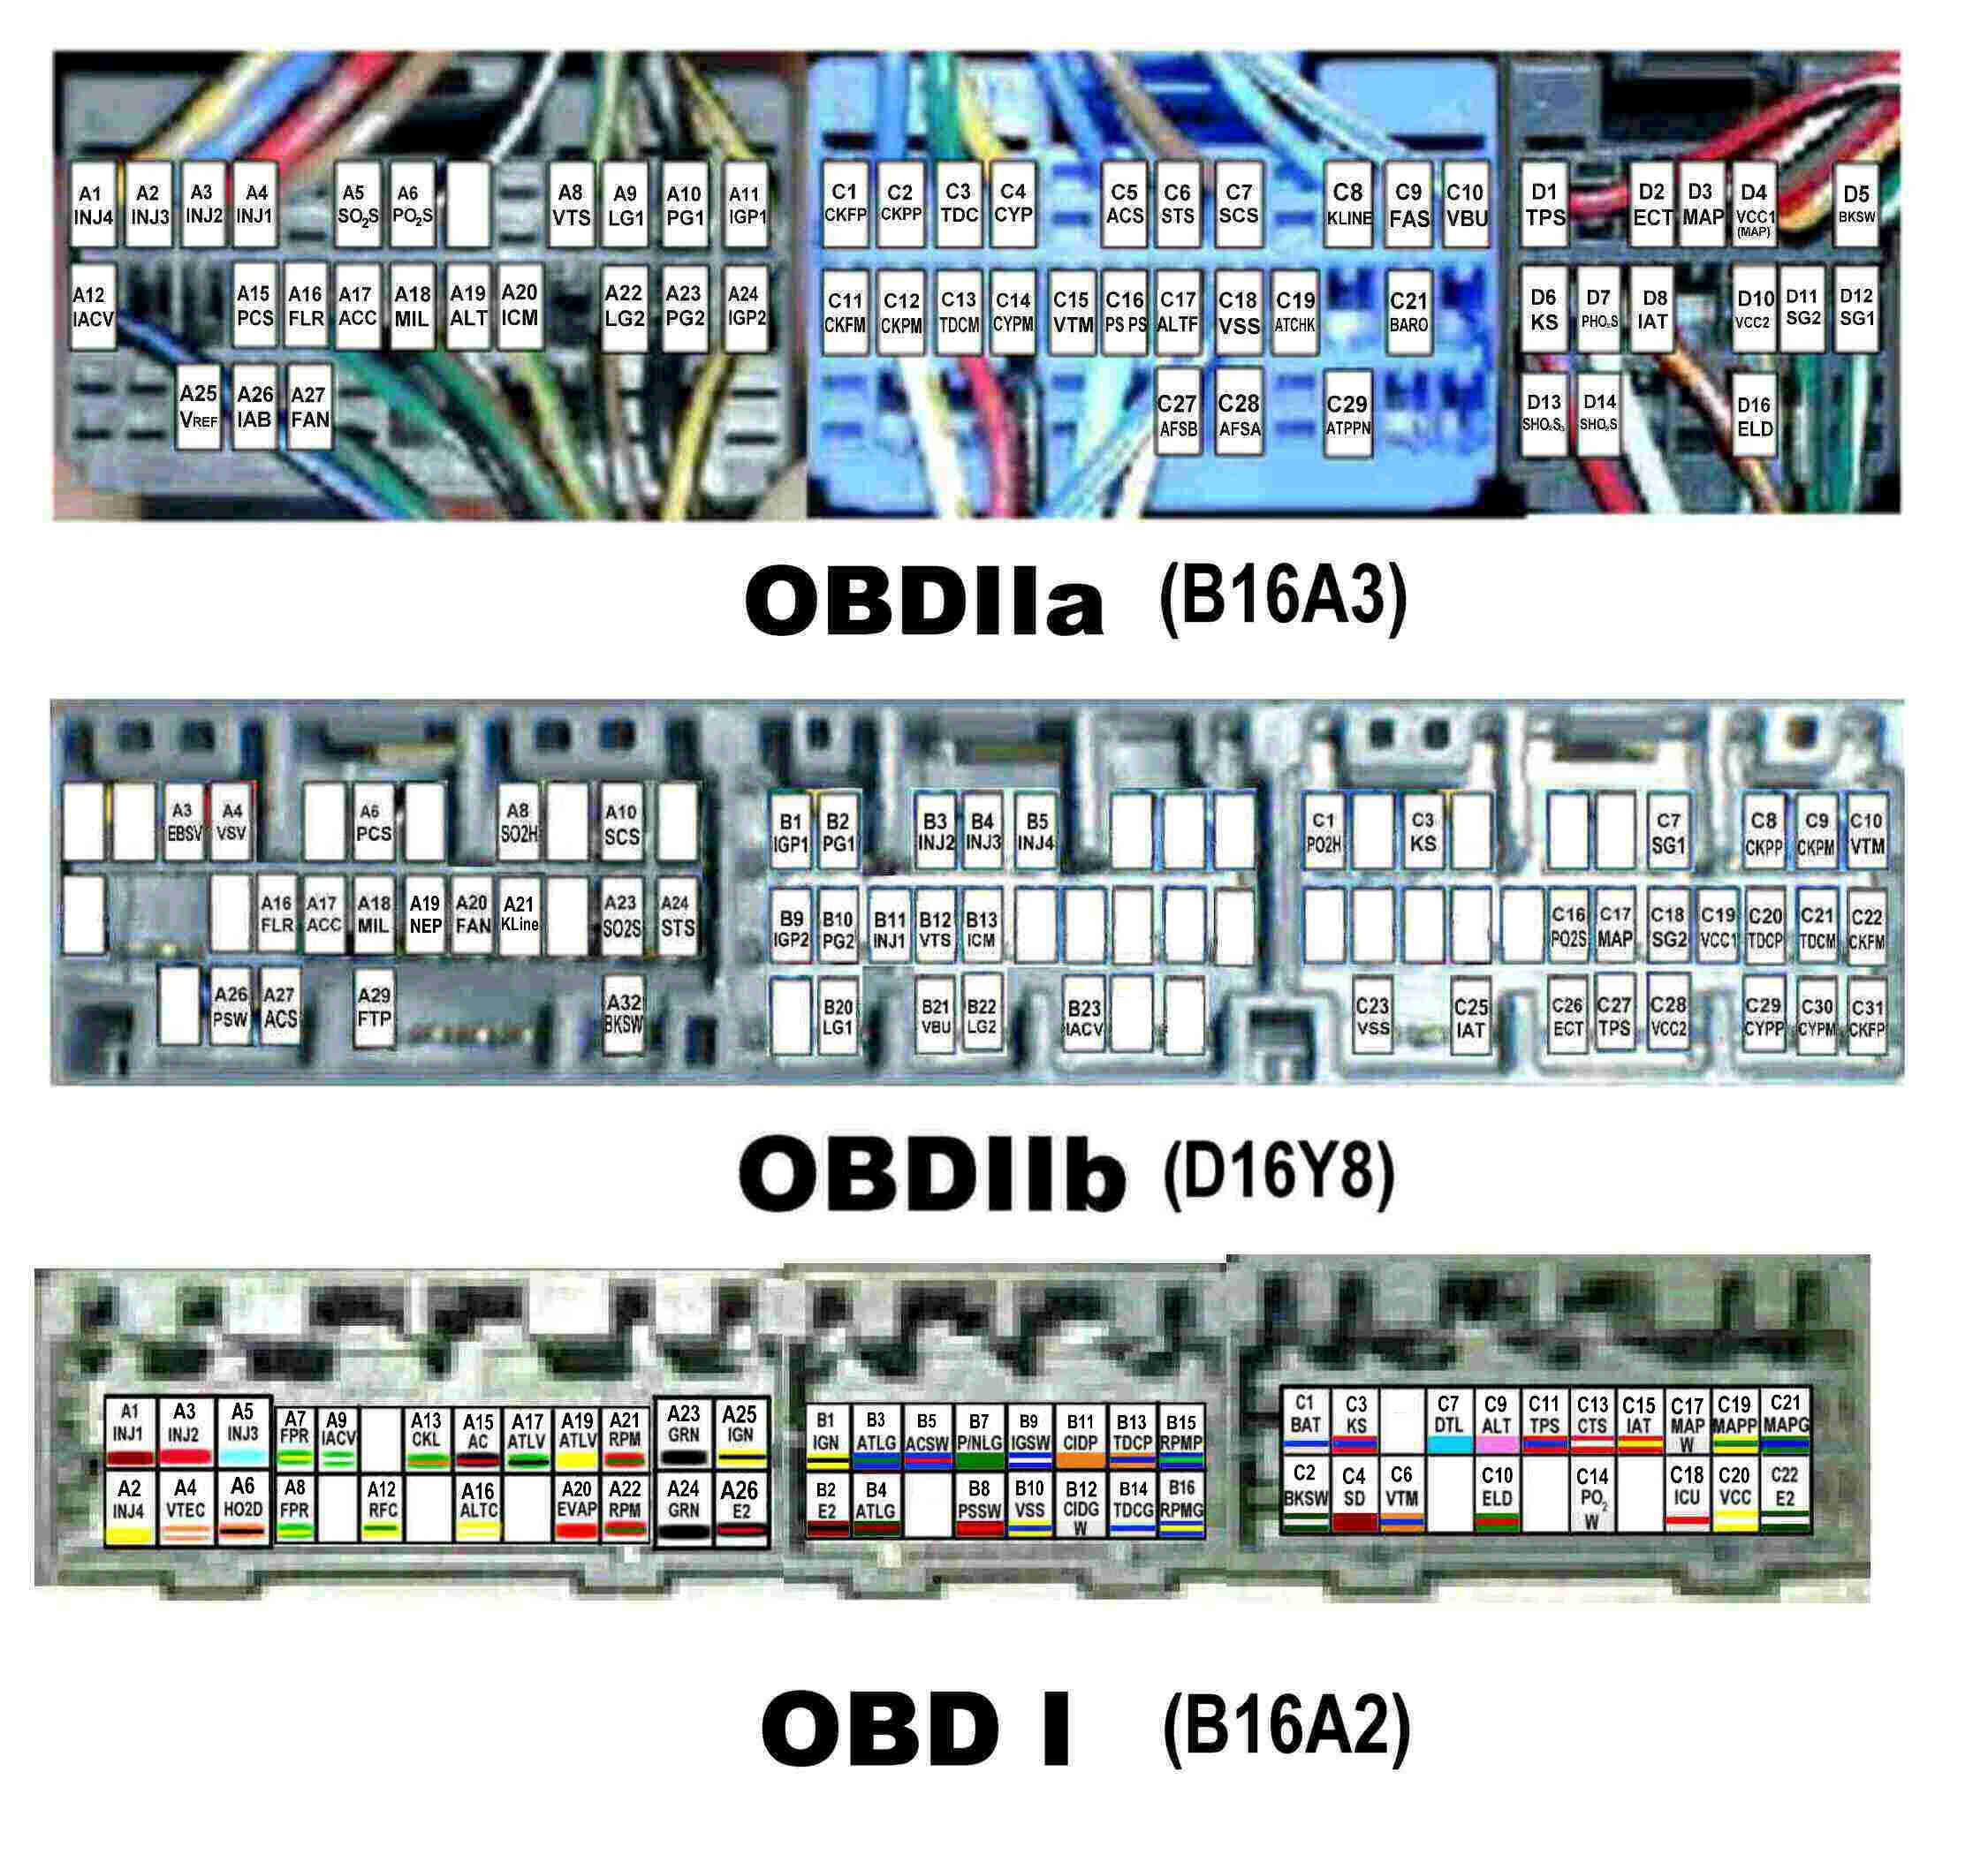 Swell P75 Ecu Wiring Diagram Basic Electronics Wiring Diagram Wiring 101 Eattedownsetwise Assnl